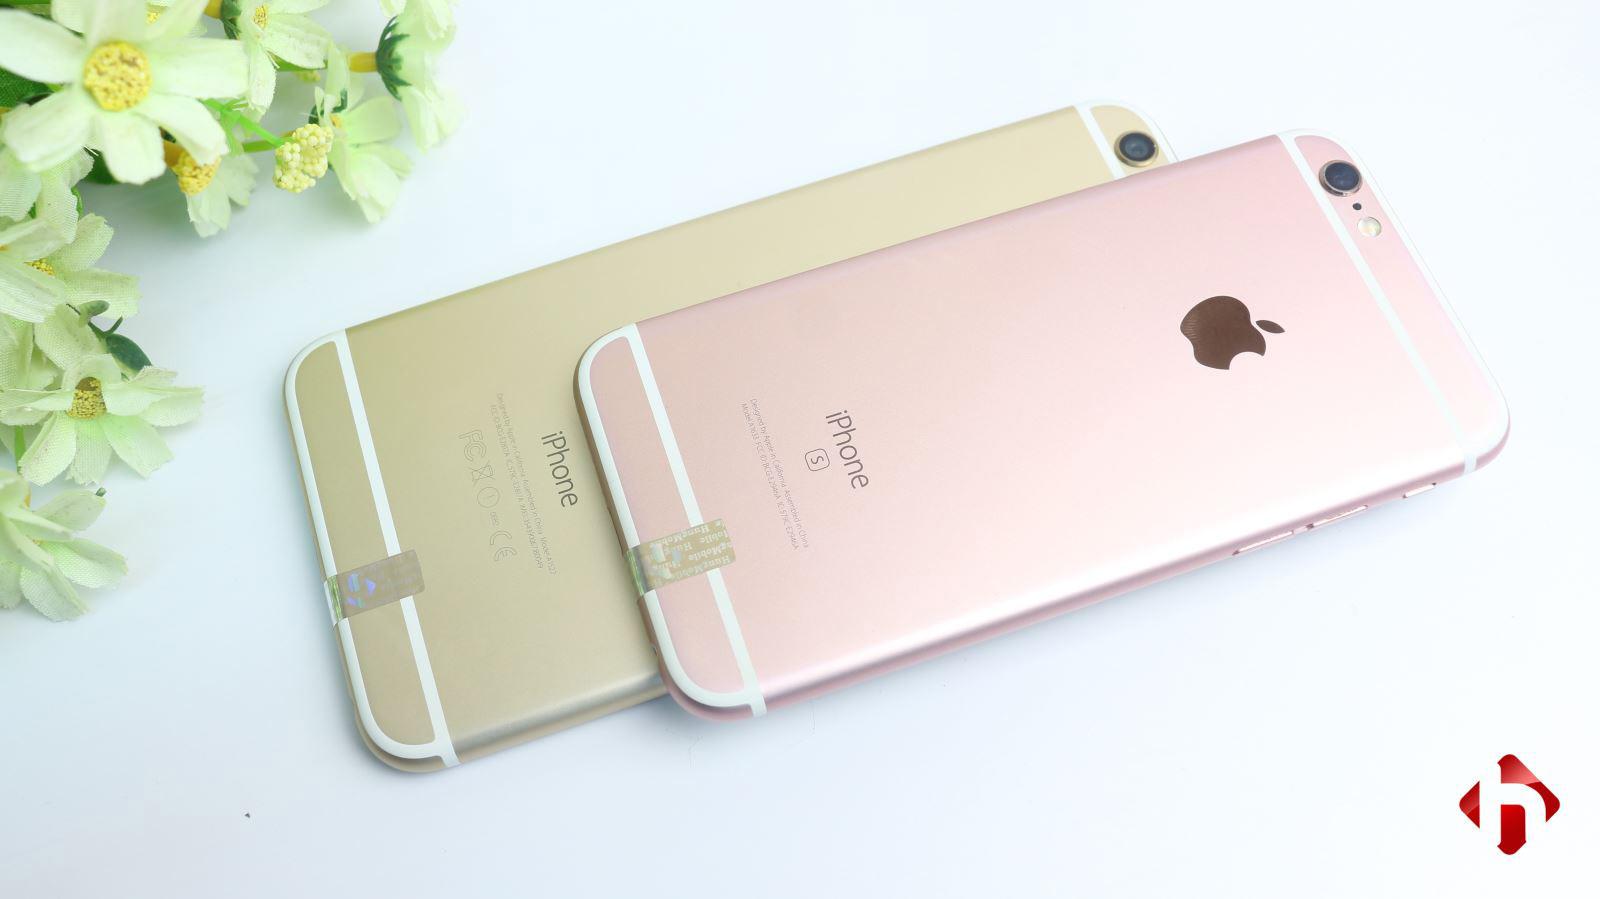 Mặt sau iPhone 6s, 6s Plus